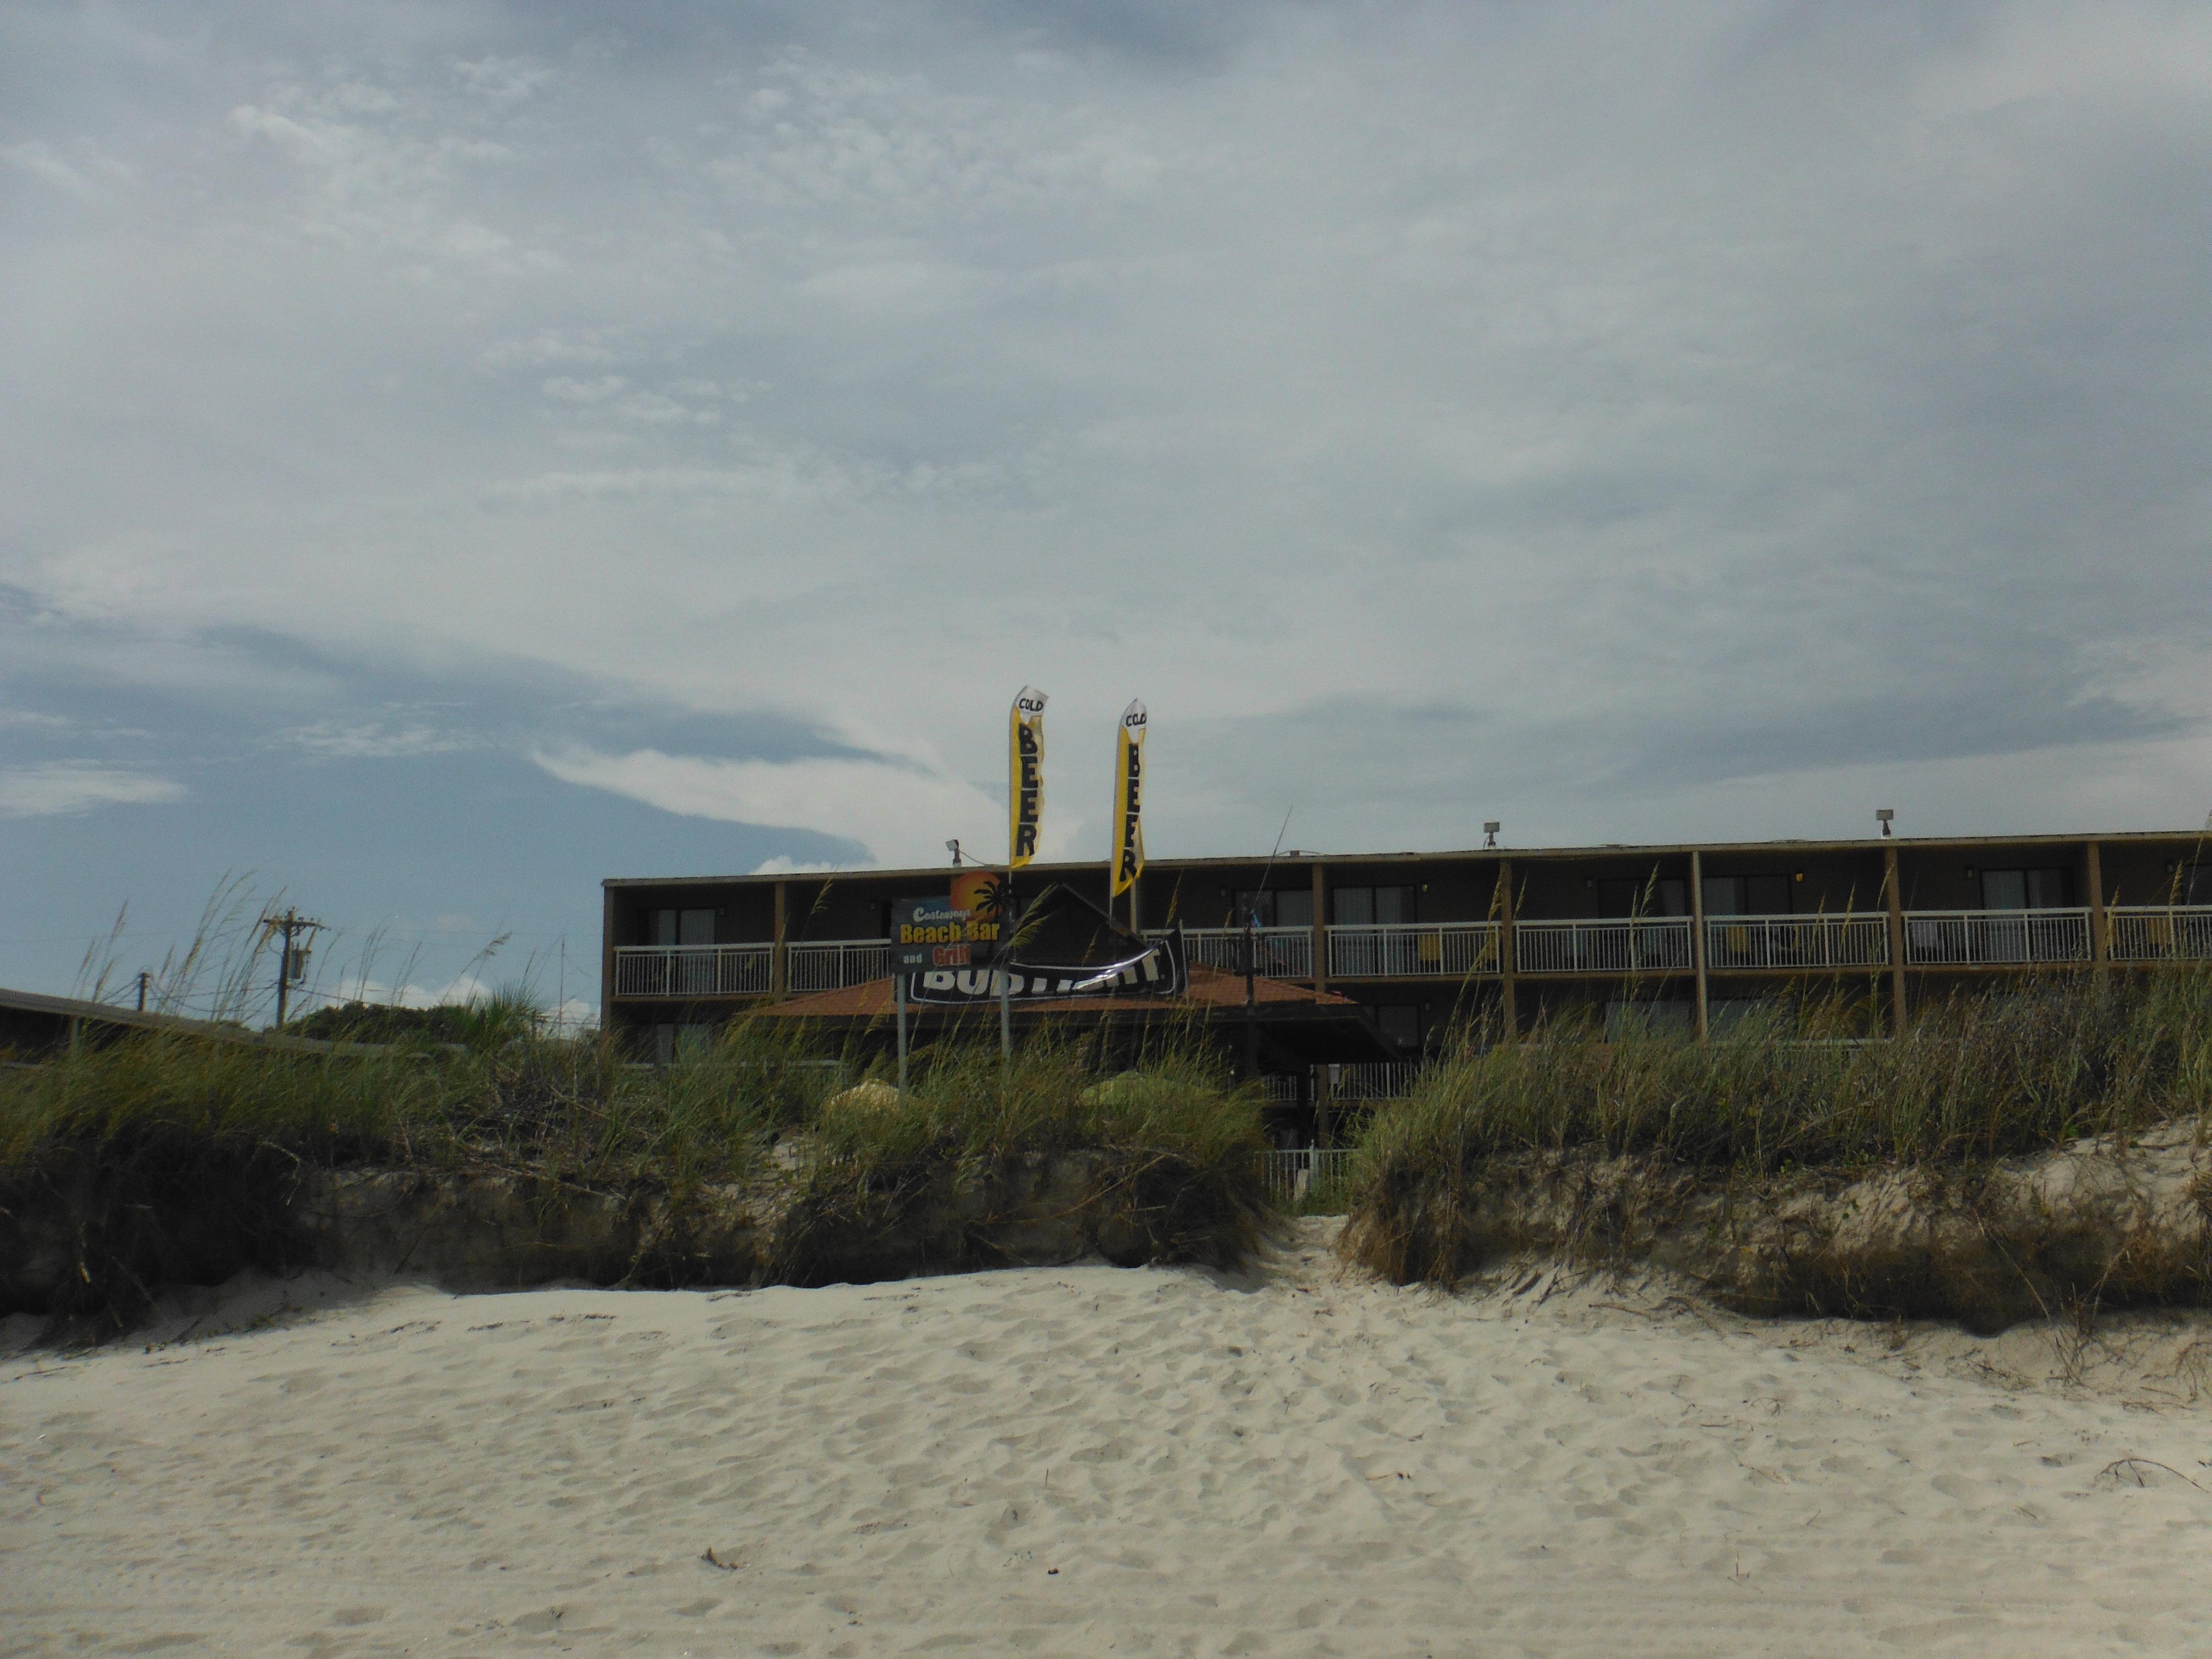 Castaway Pool Bar and Hotel